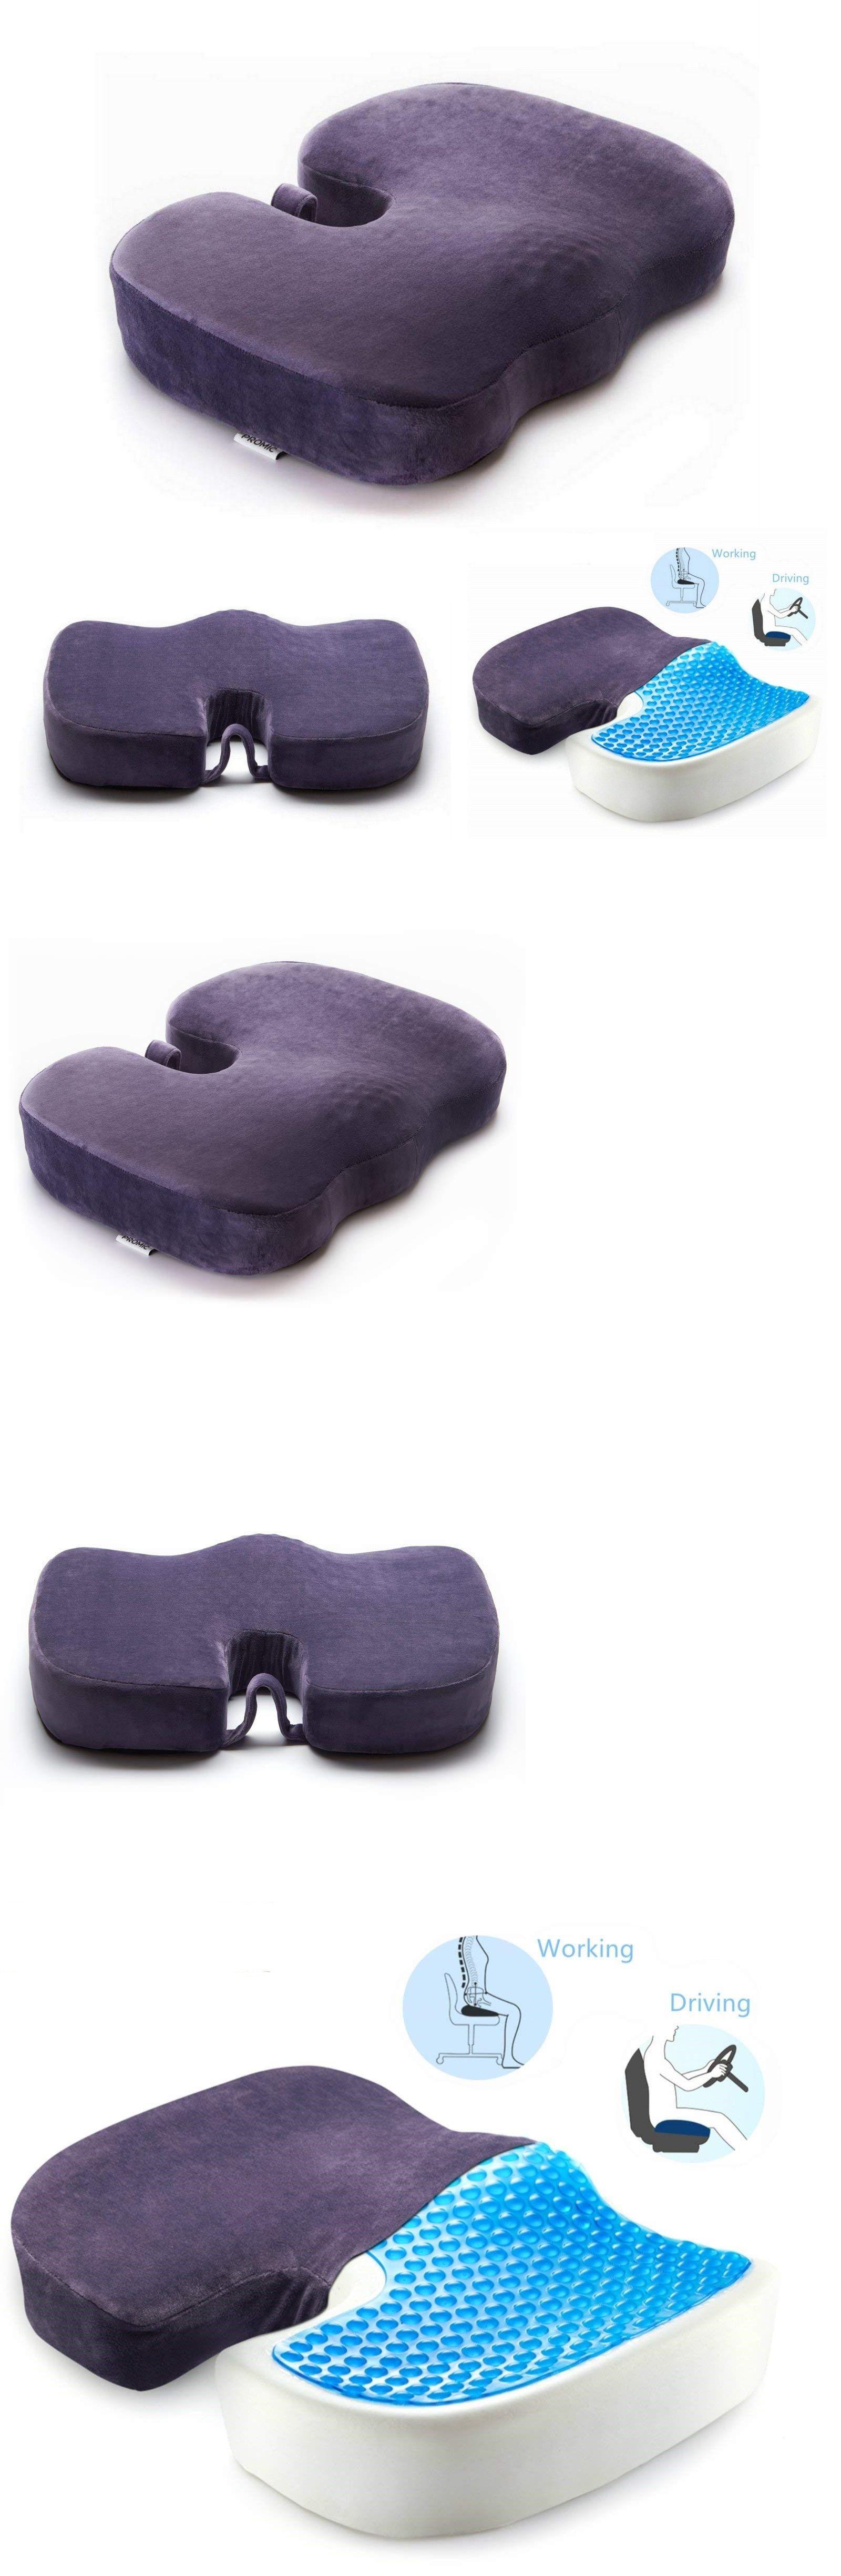 Memory foam cushion seat pillow orthopedic car home office chair